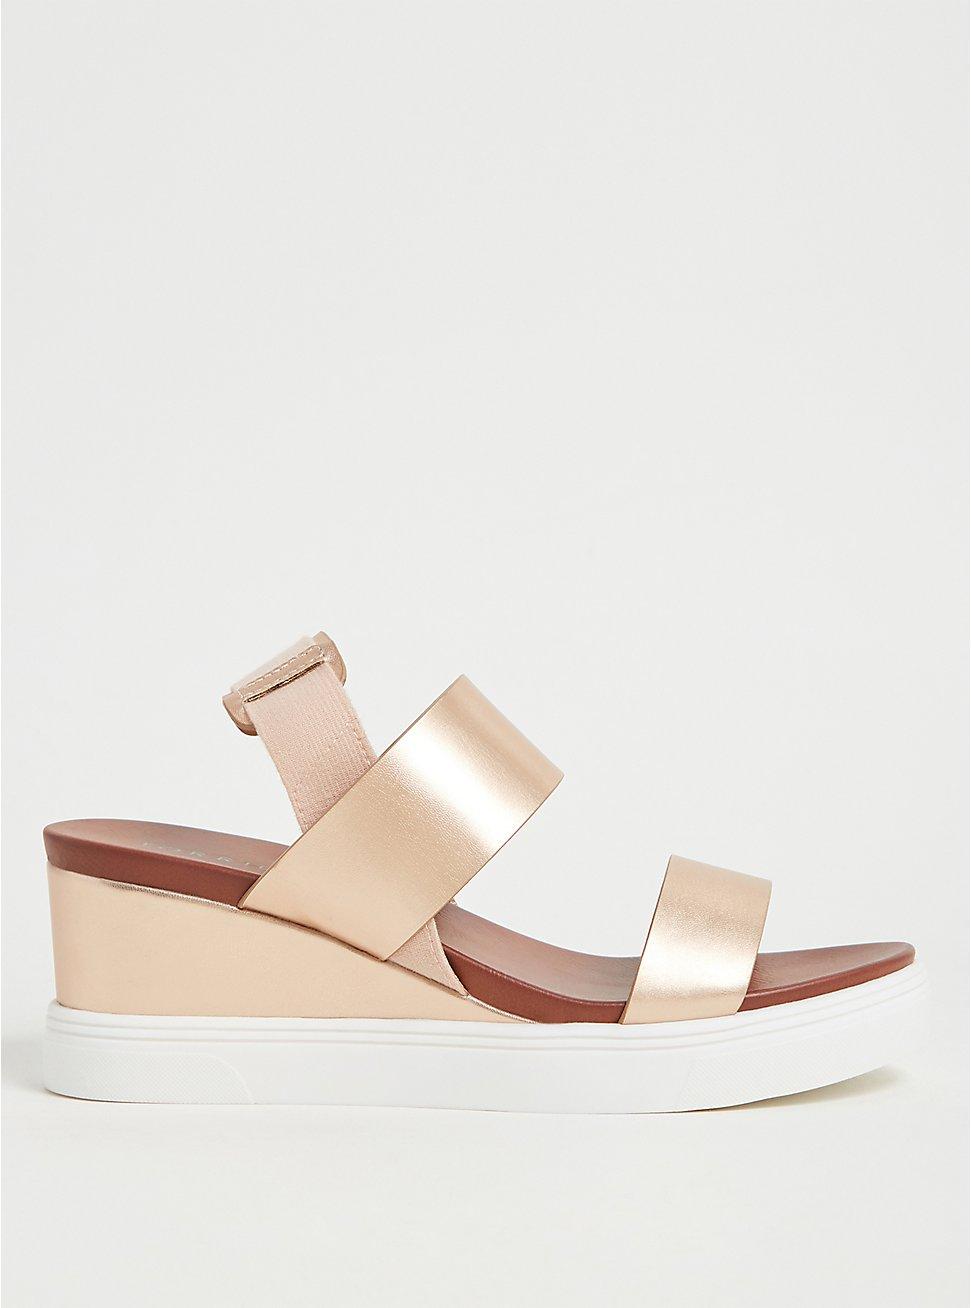 Plus Size Metallic Rose Gold Faux Leather Wedge Sandal (WW), ROSE GOLD, hi-res